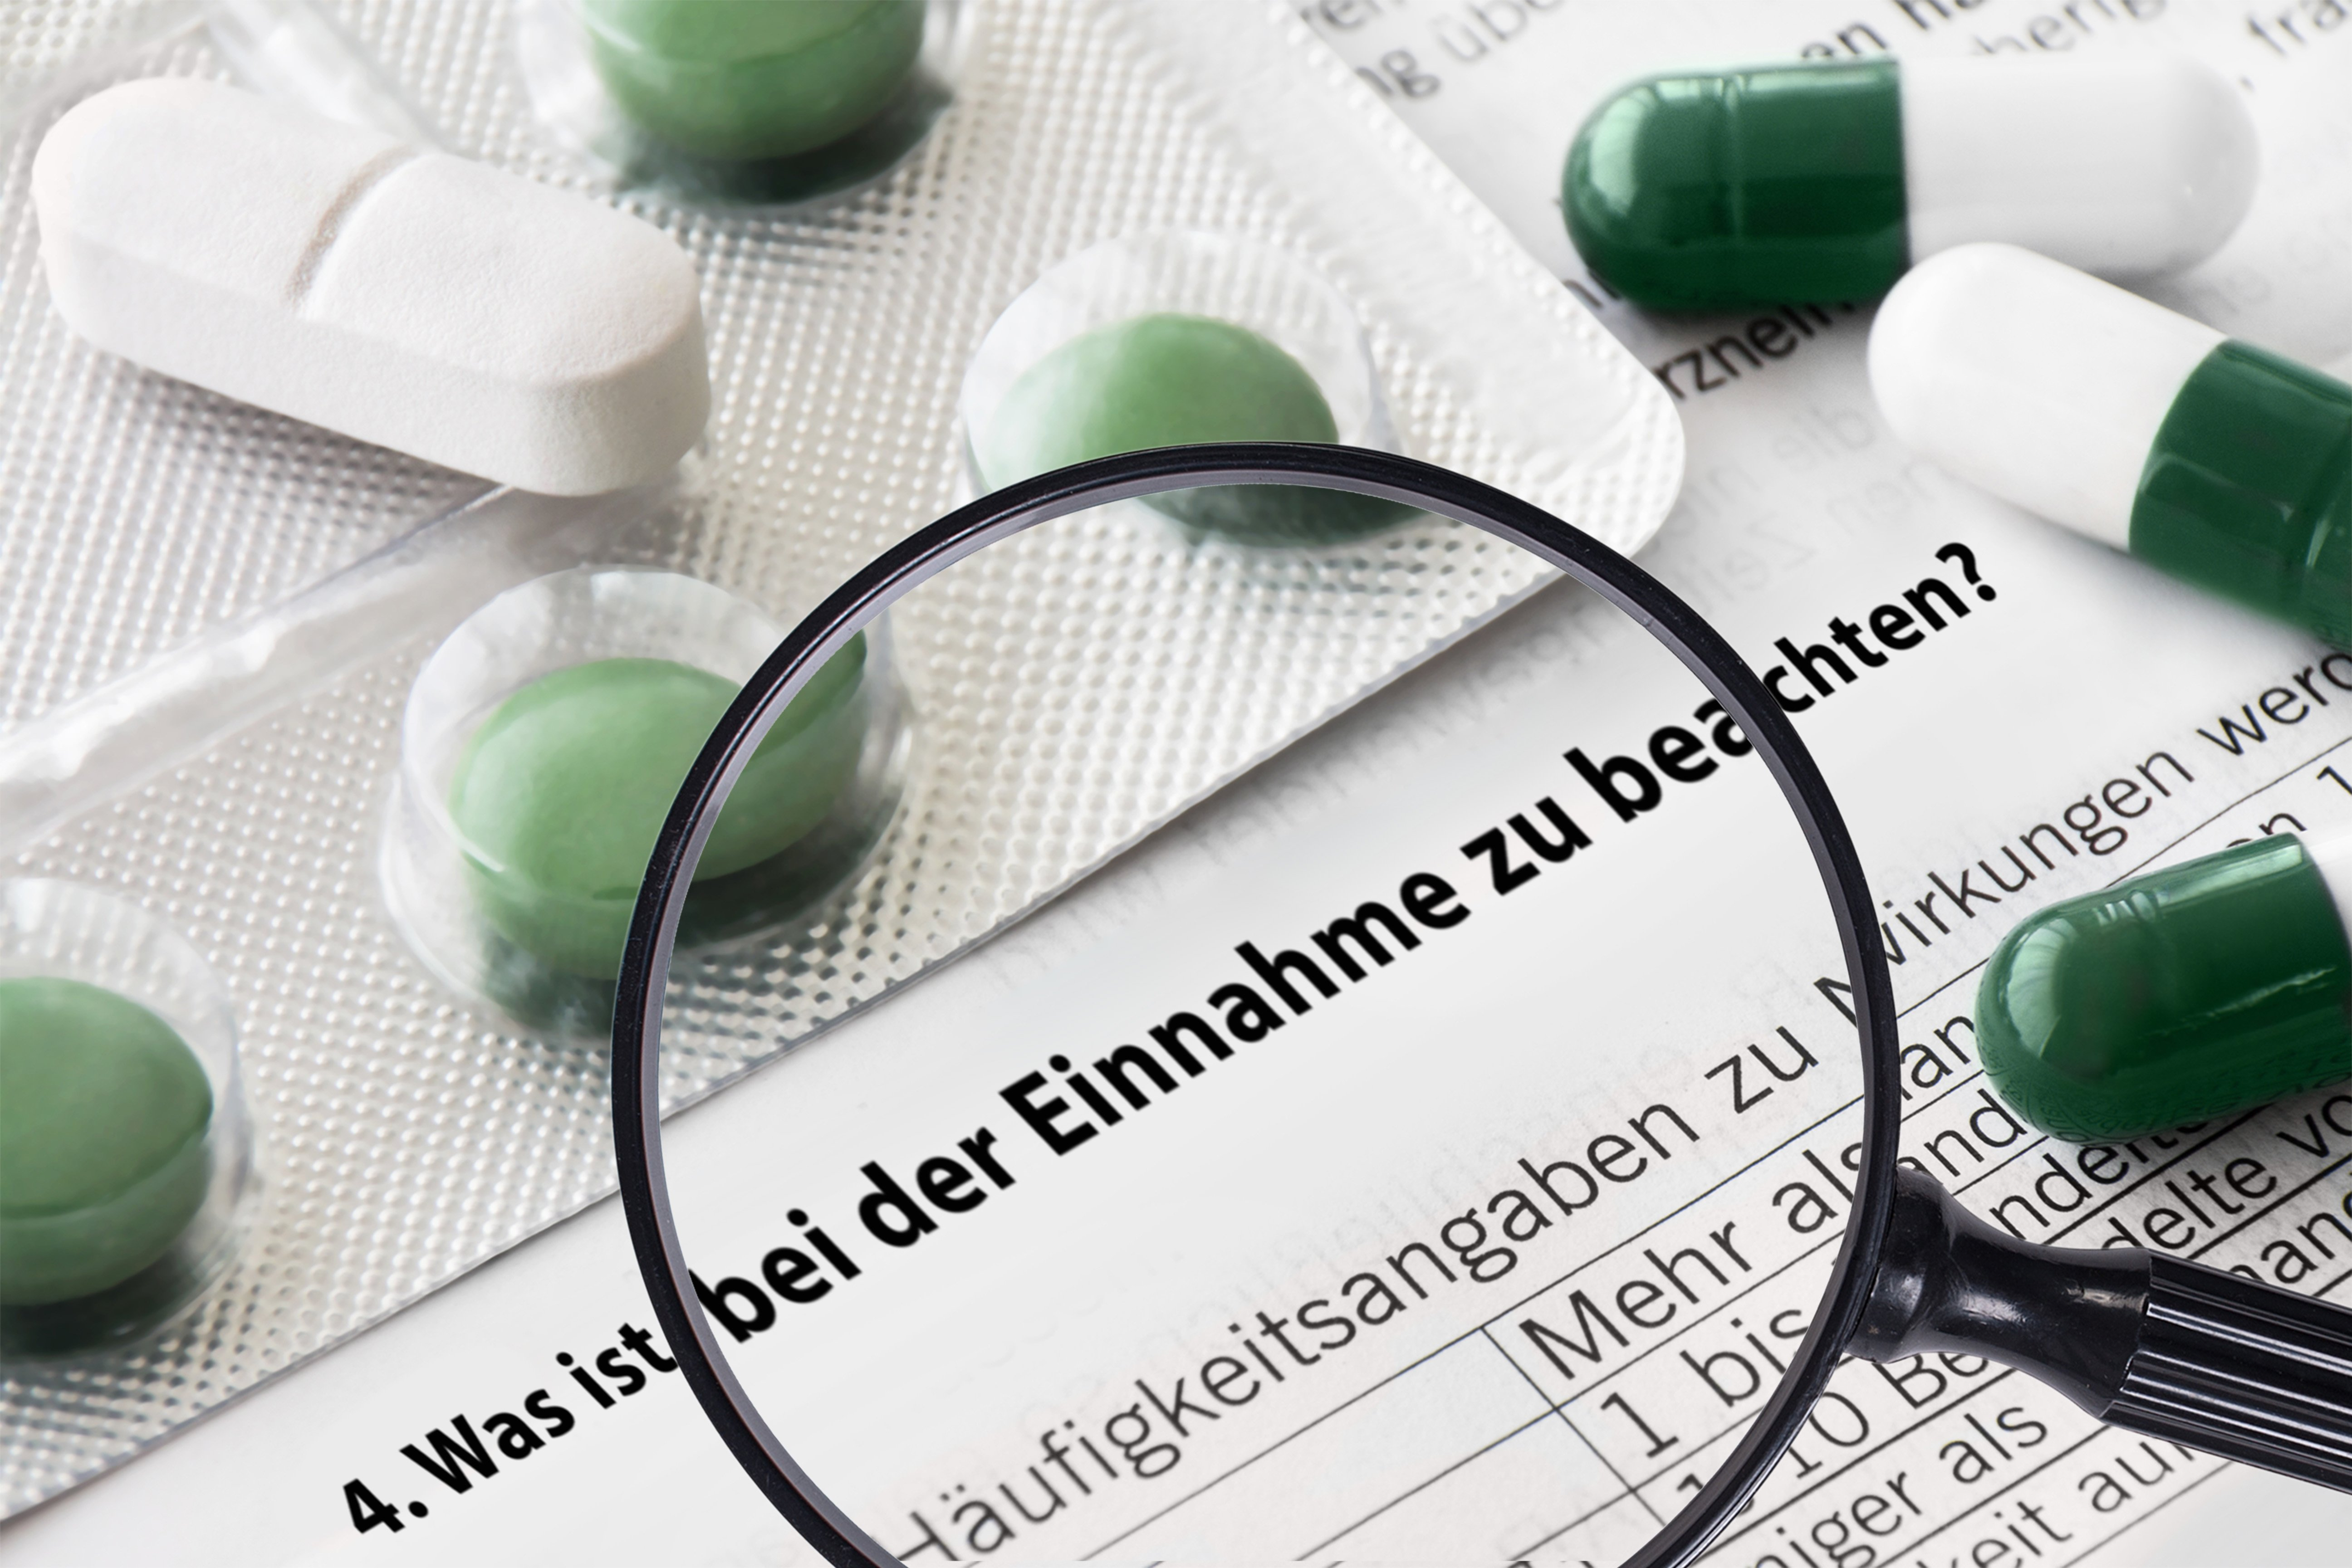 V 1 nebenwirkungen stada mega penicillin 5 Beipackzettel von